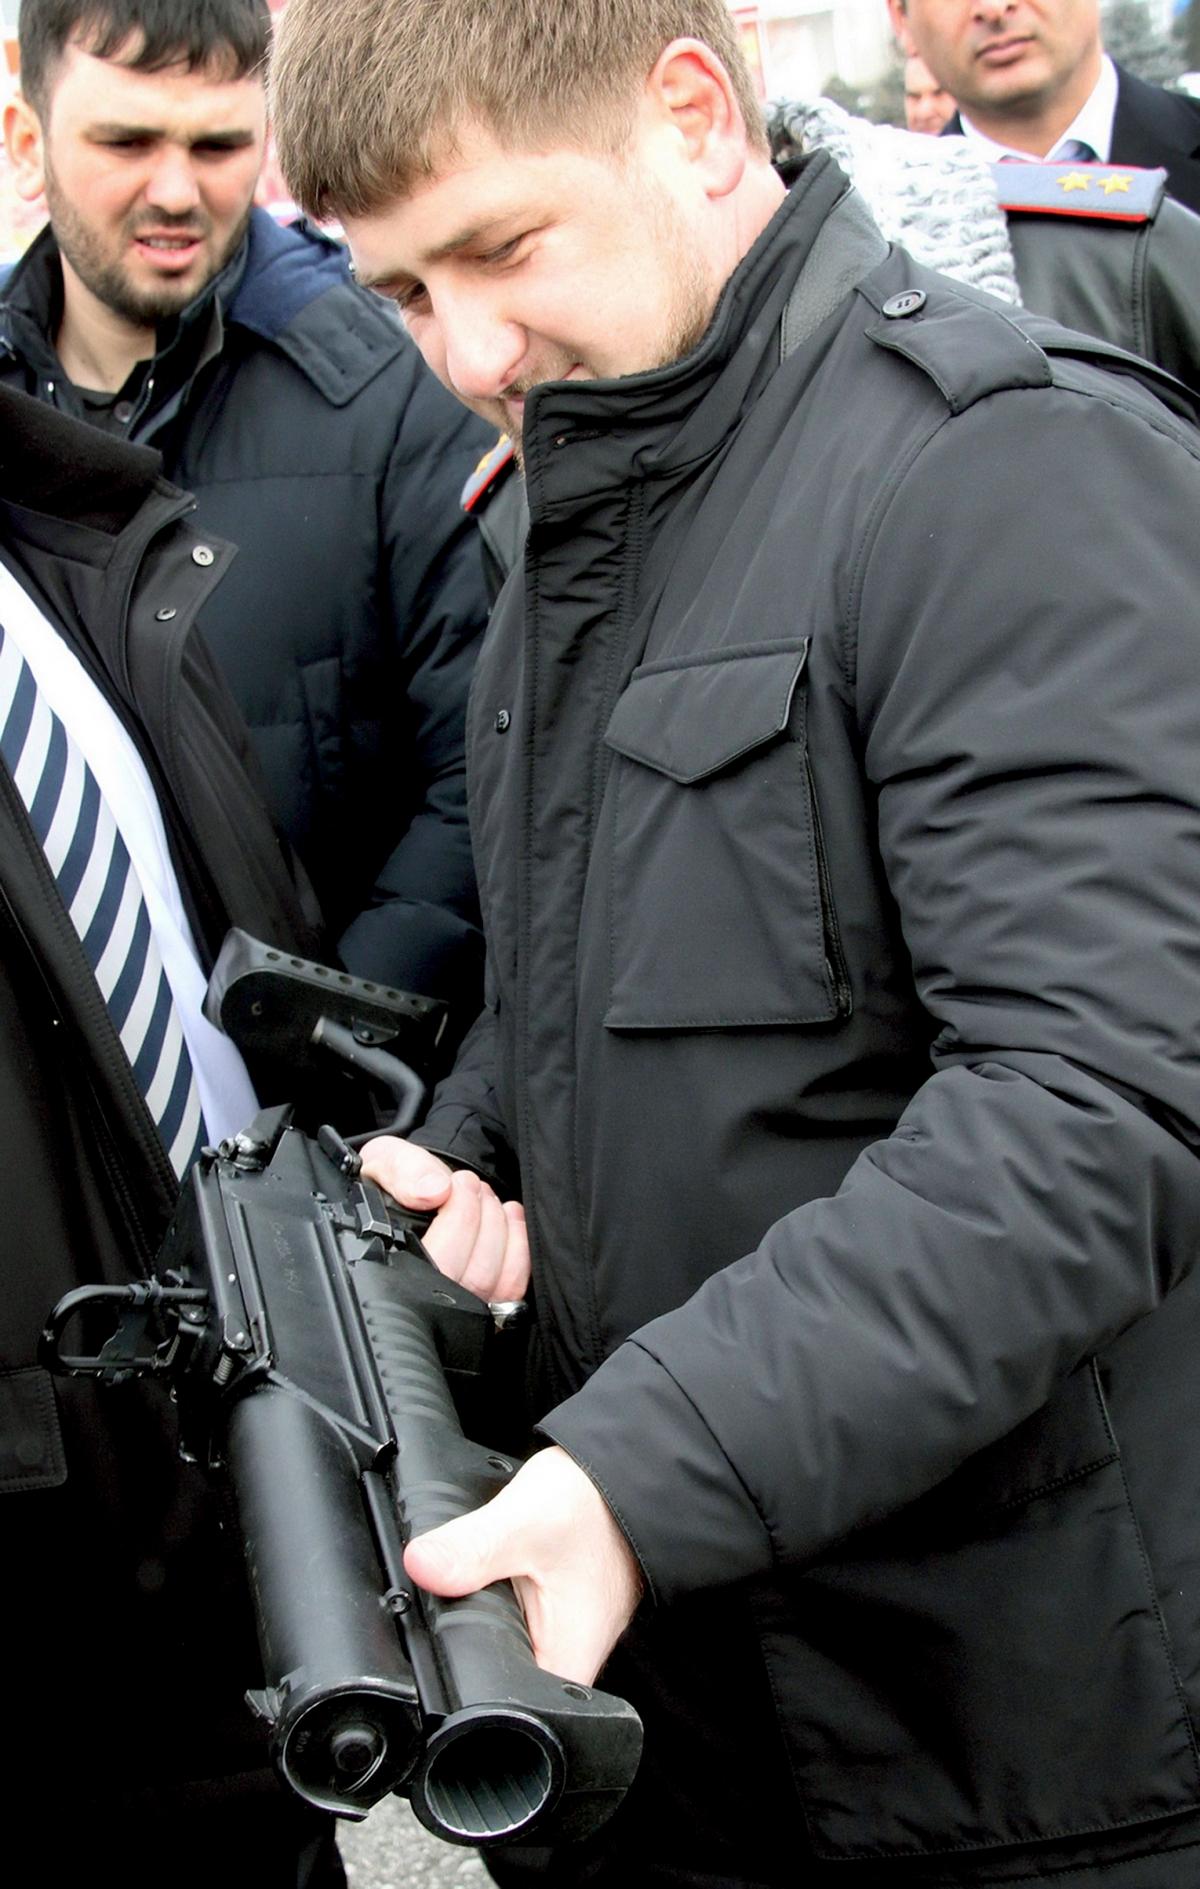 Ramzan Kadyrov inspects a GM-95 grenade launcher